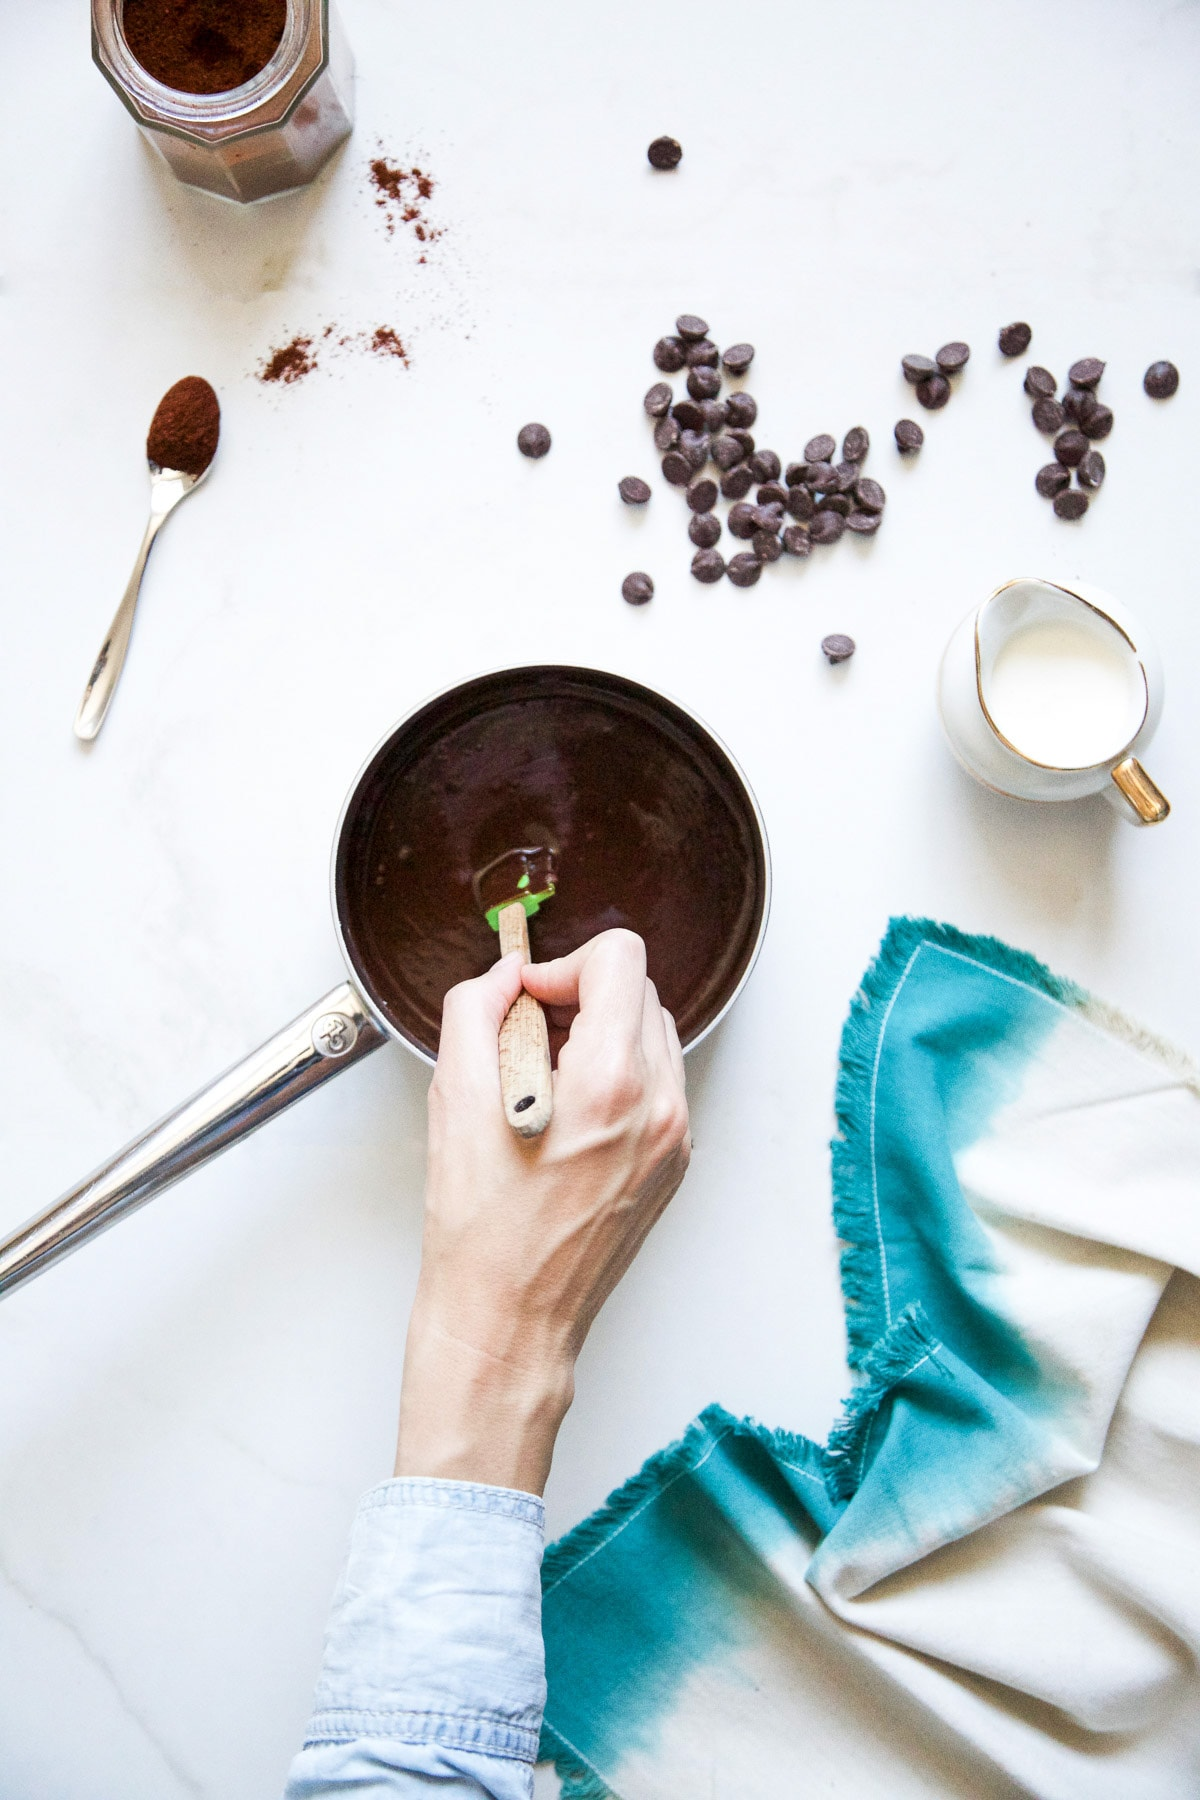 Cinnamon Churros with Chili Chocolate by Sugar & Cloth, an award winning DIY, recipes, and home decor blog.